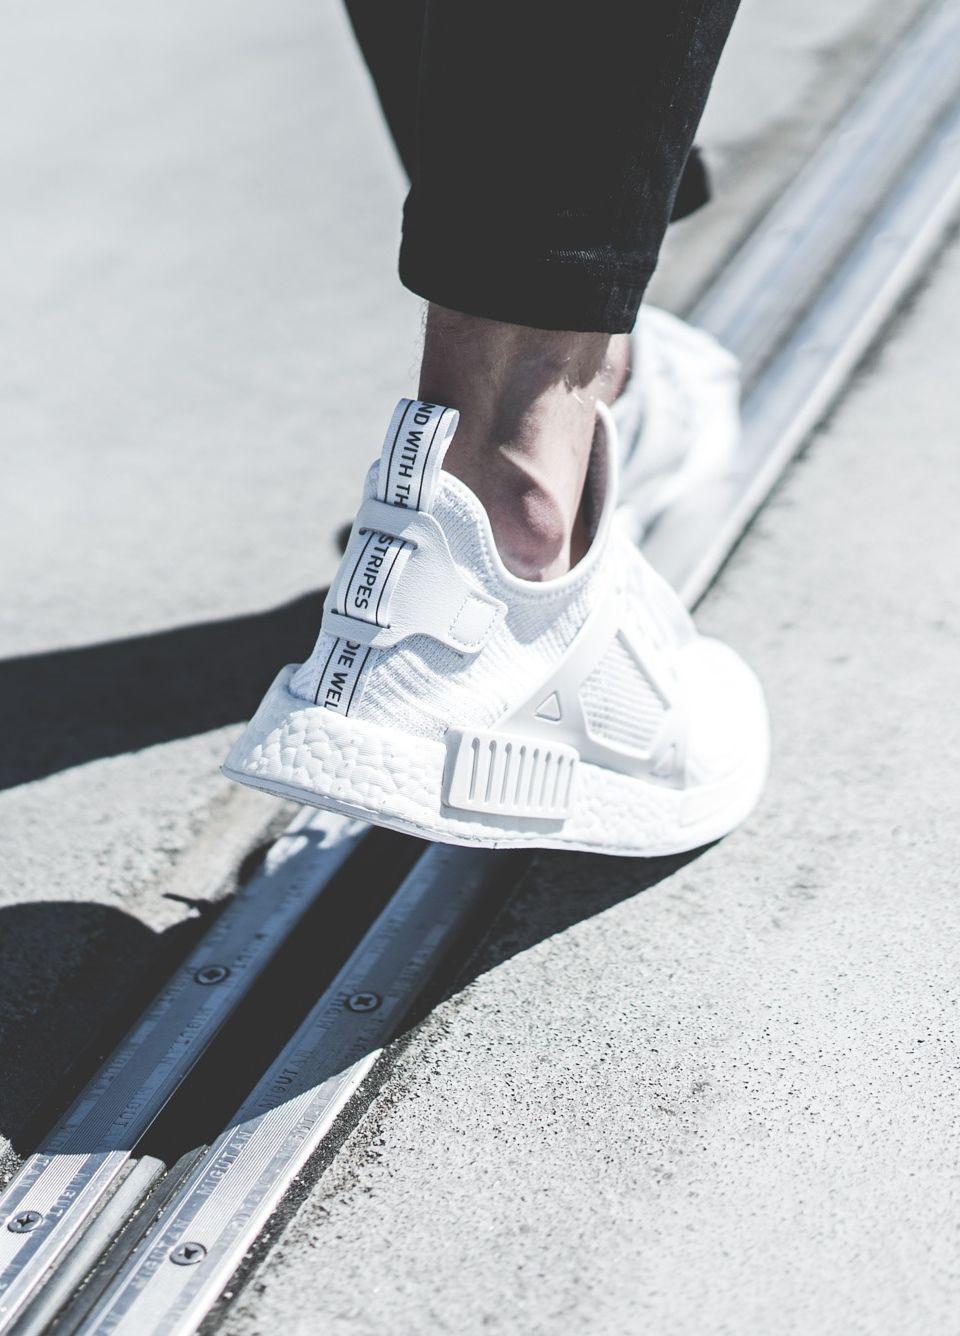 online retailer 7d3dc fa81b adidas NMDXR1 PK white sneakernews Sneakers StreetStyle Kicks